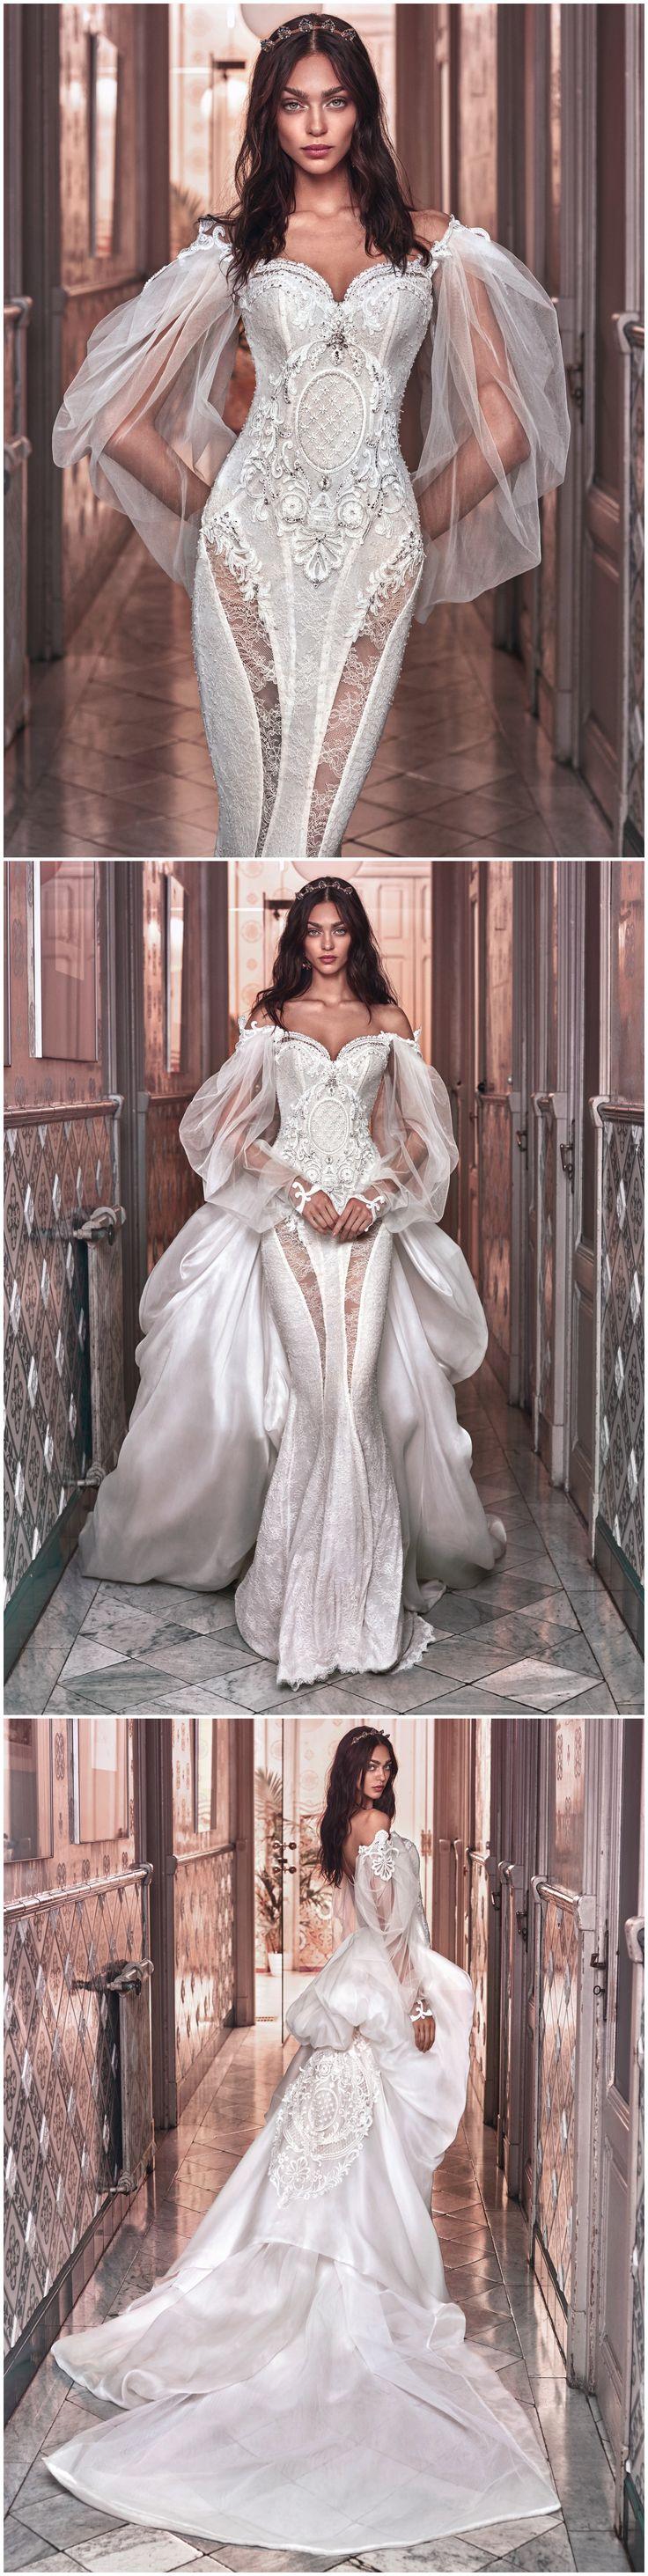 Wedding Dresses » Galia Lahav Wedding Dresses 2018 Victorian Affinity Collection » ❤️ More: http://www.weddinginclude.com/2017/06/galia-lahav-wedding-dresses-2018-victorian-affinity-collection/